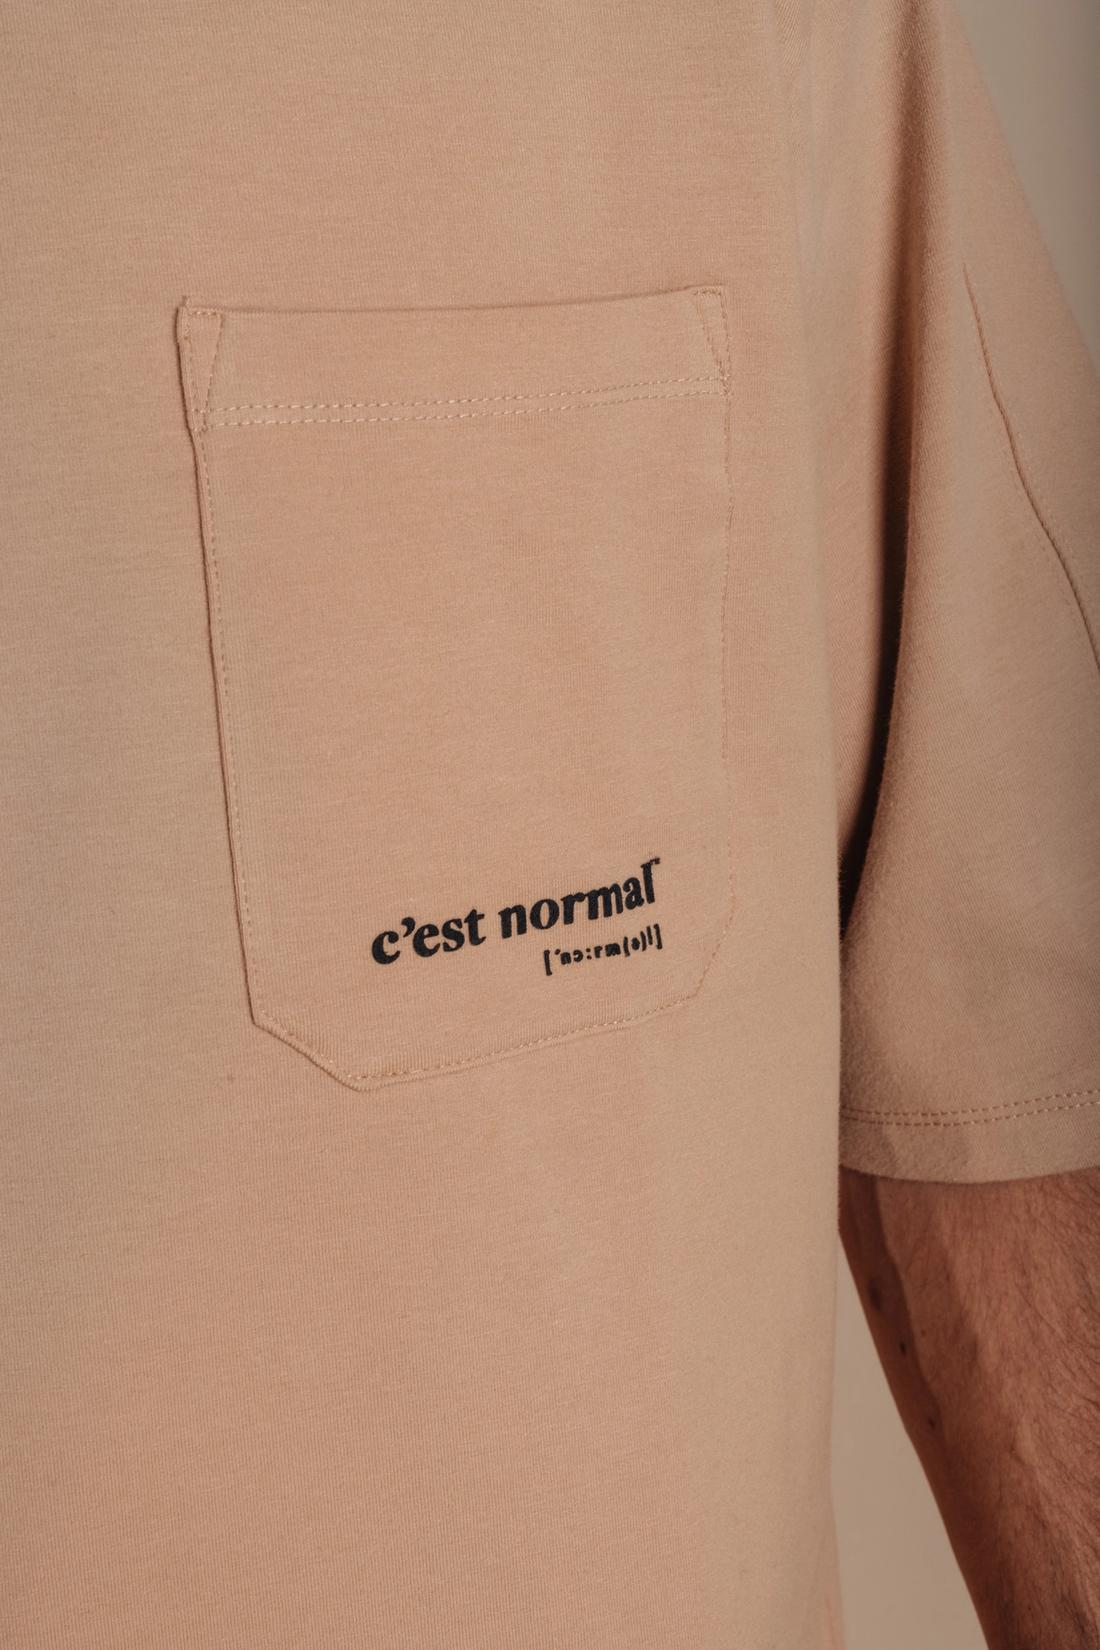 The proper t shirt